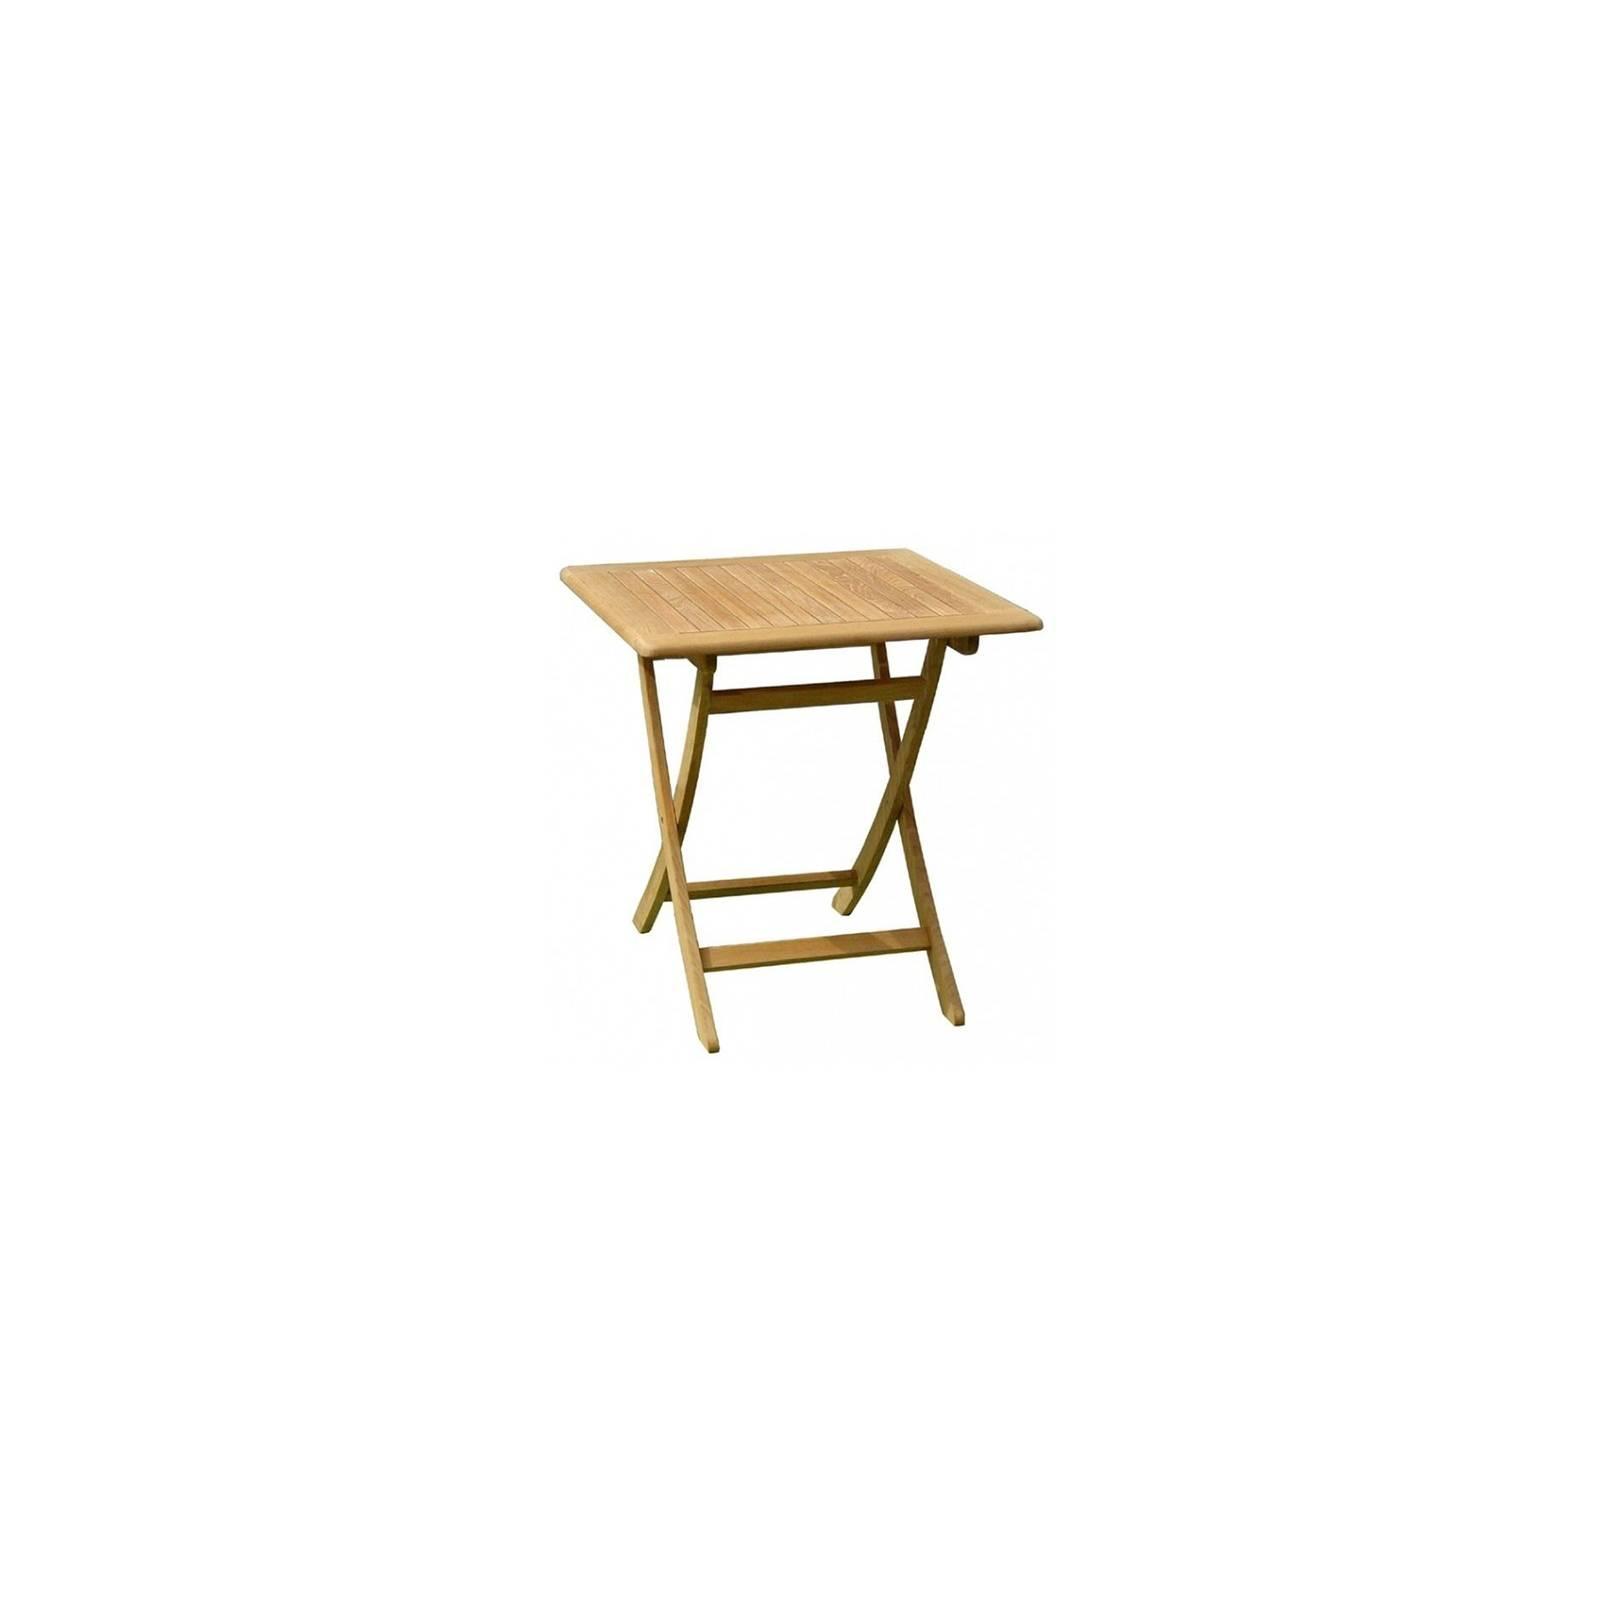 Table De Repas Carré Pliante Taman Teck Recyclé - meuble de jardin